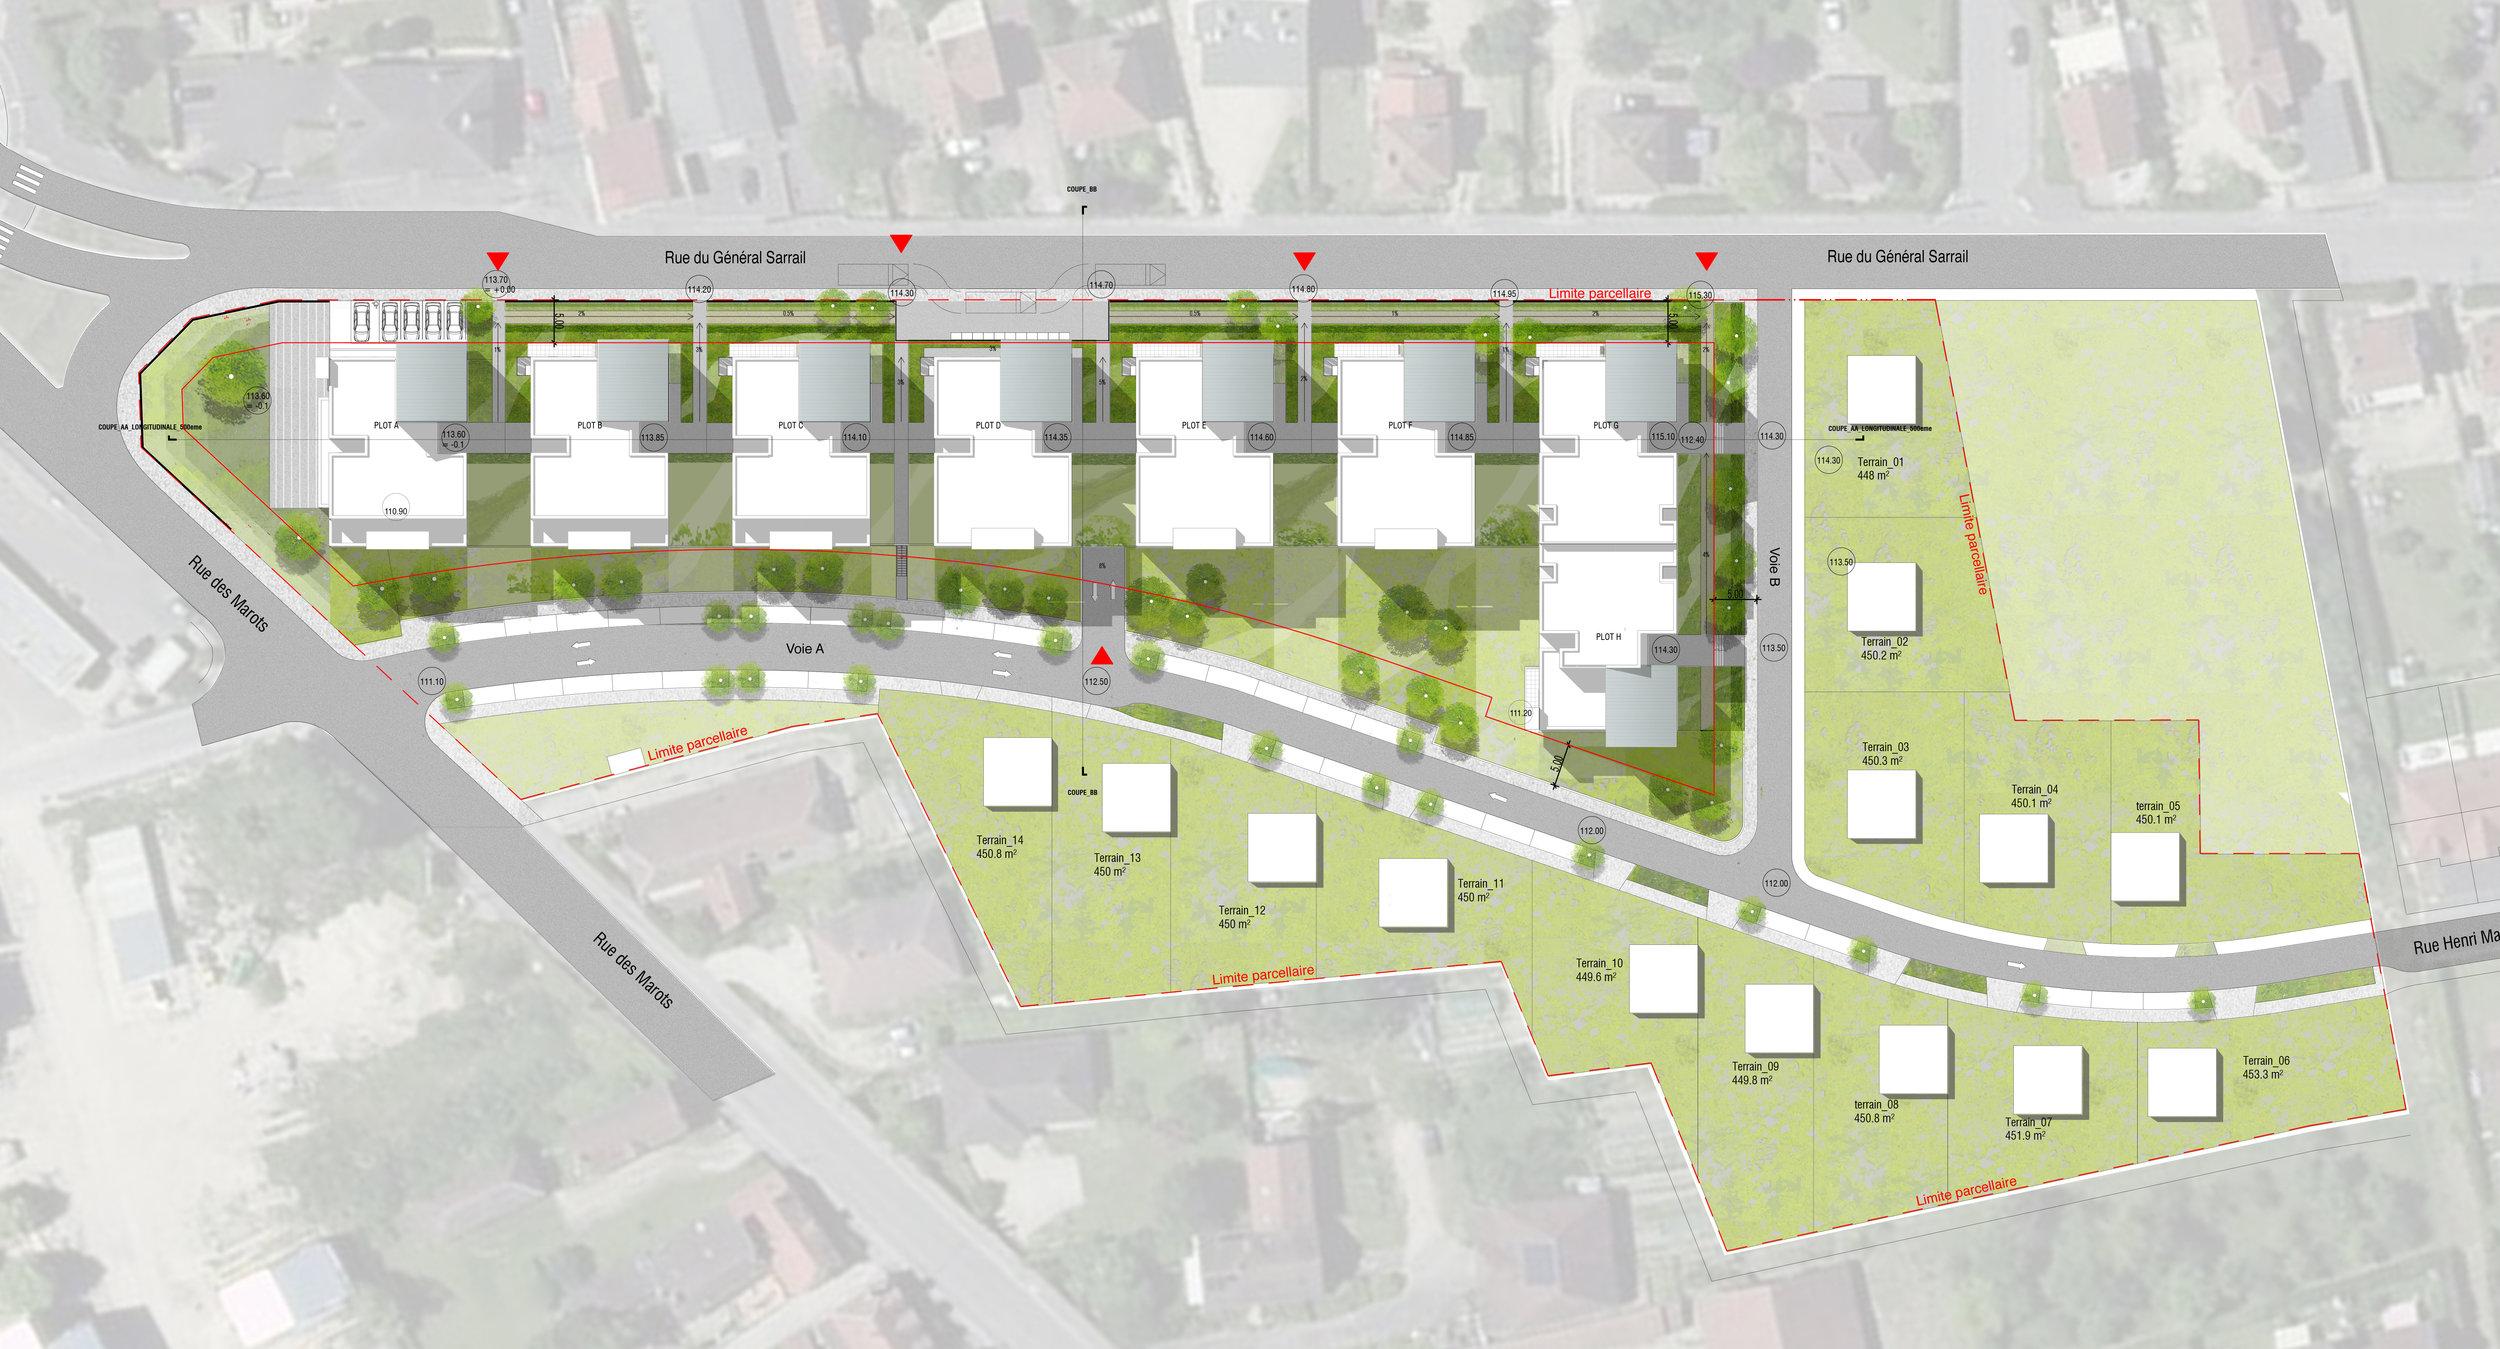 troyes_collective_housing_public_outdoor_design_christophe_gautrand_landscape_5.jpg